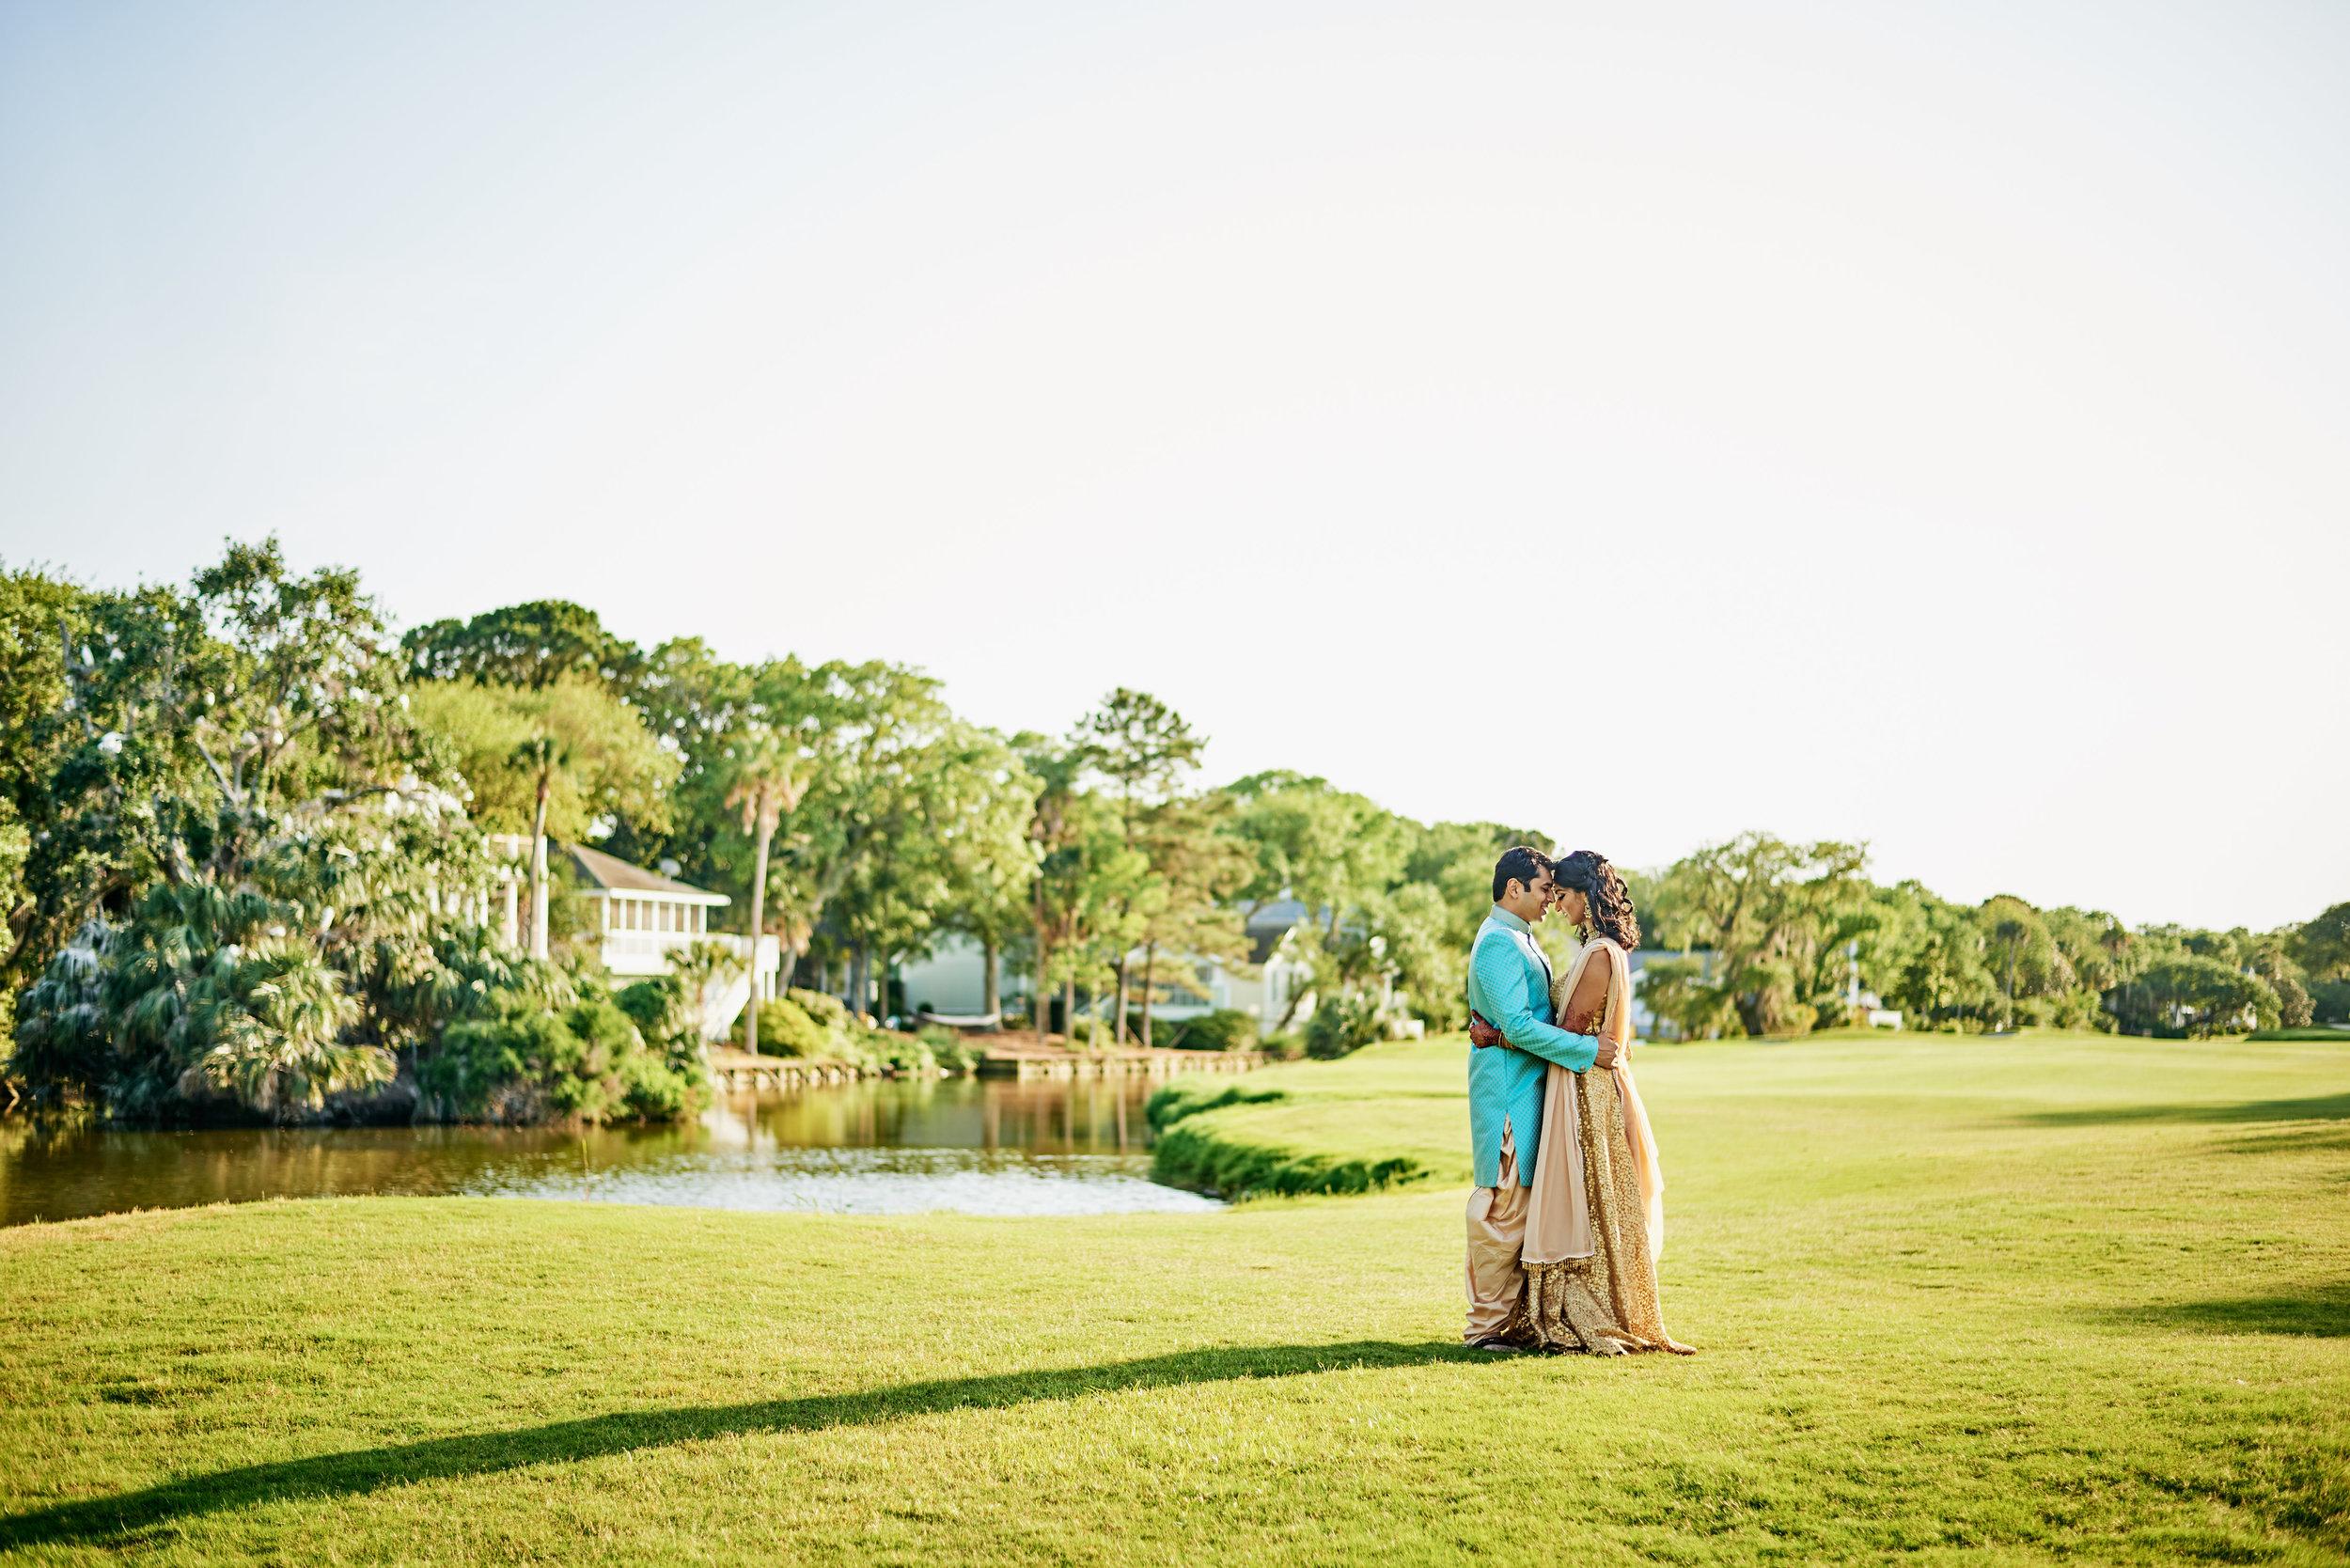 Wild Dunes Wedding Photos by Vitor Lindo _ 9.jpg